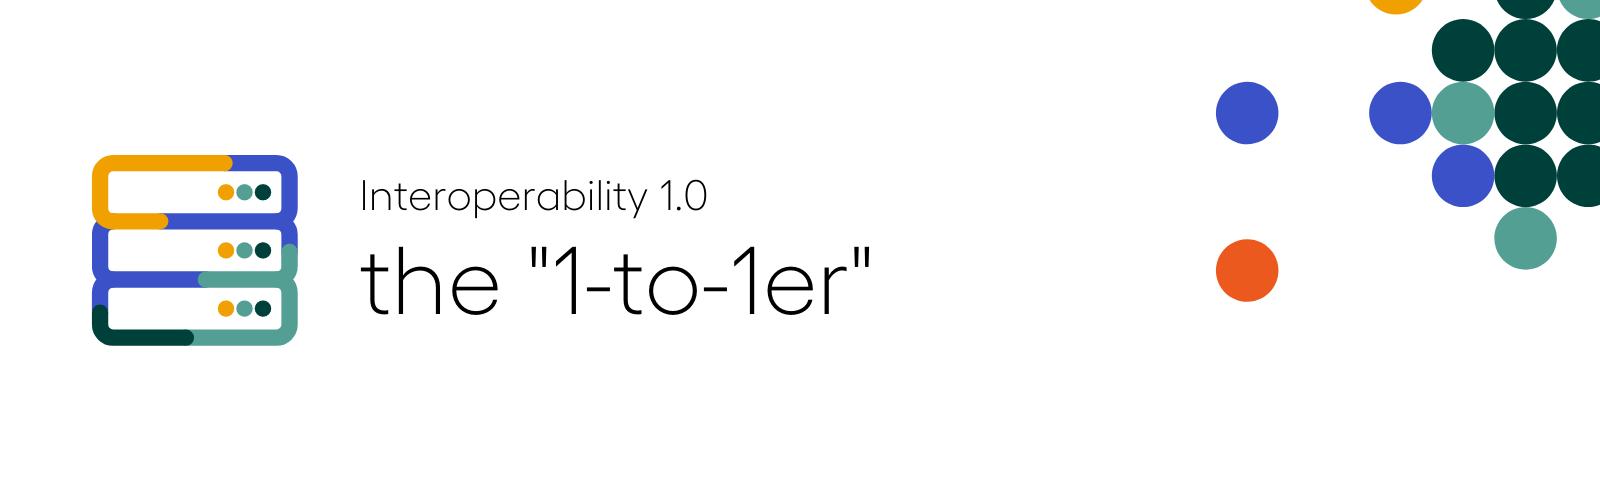 Interoperability 1.0